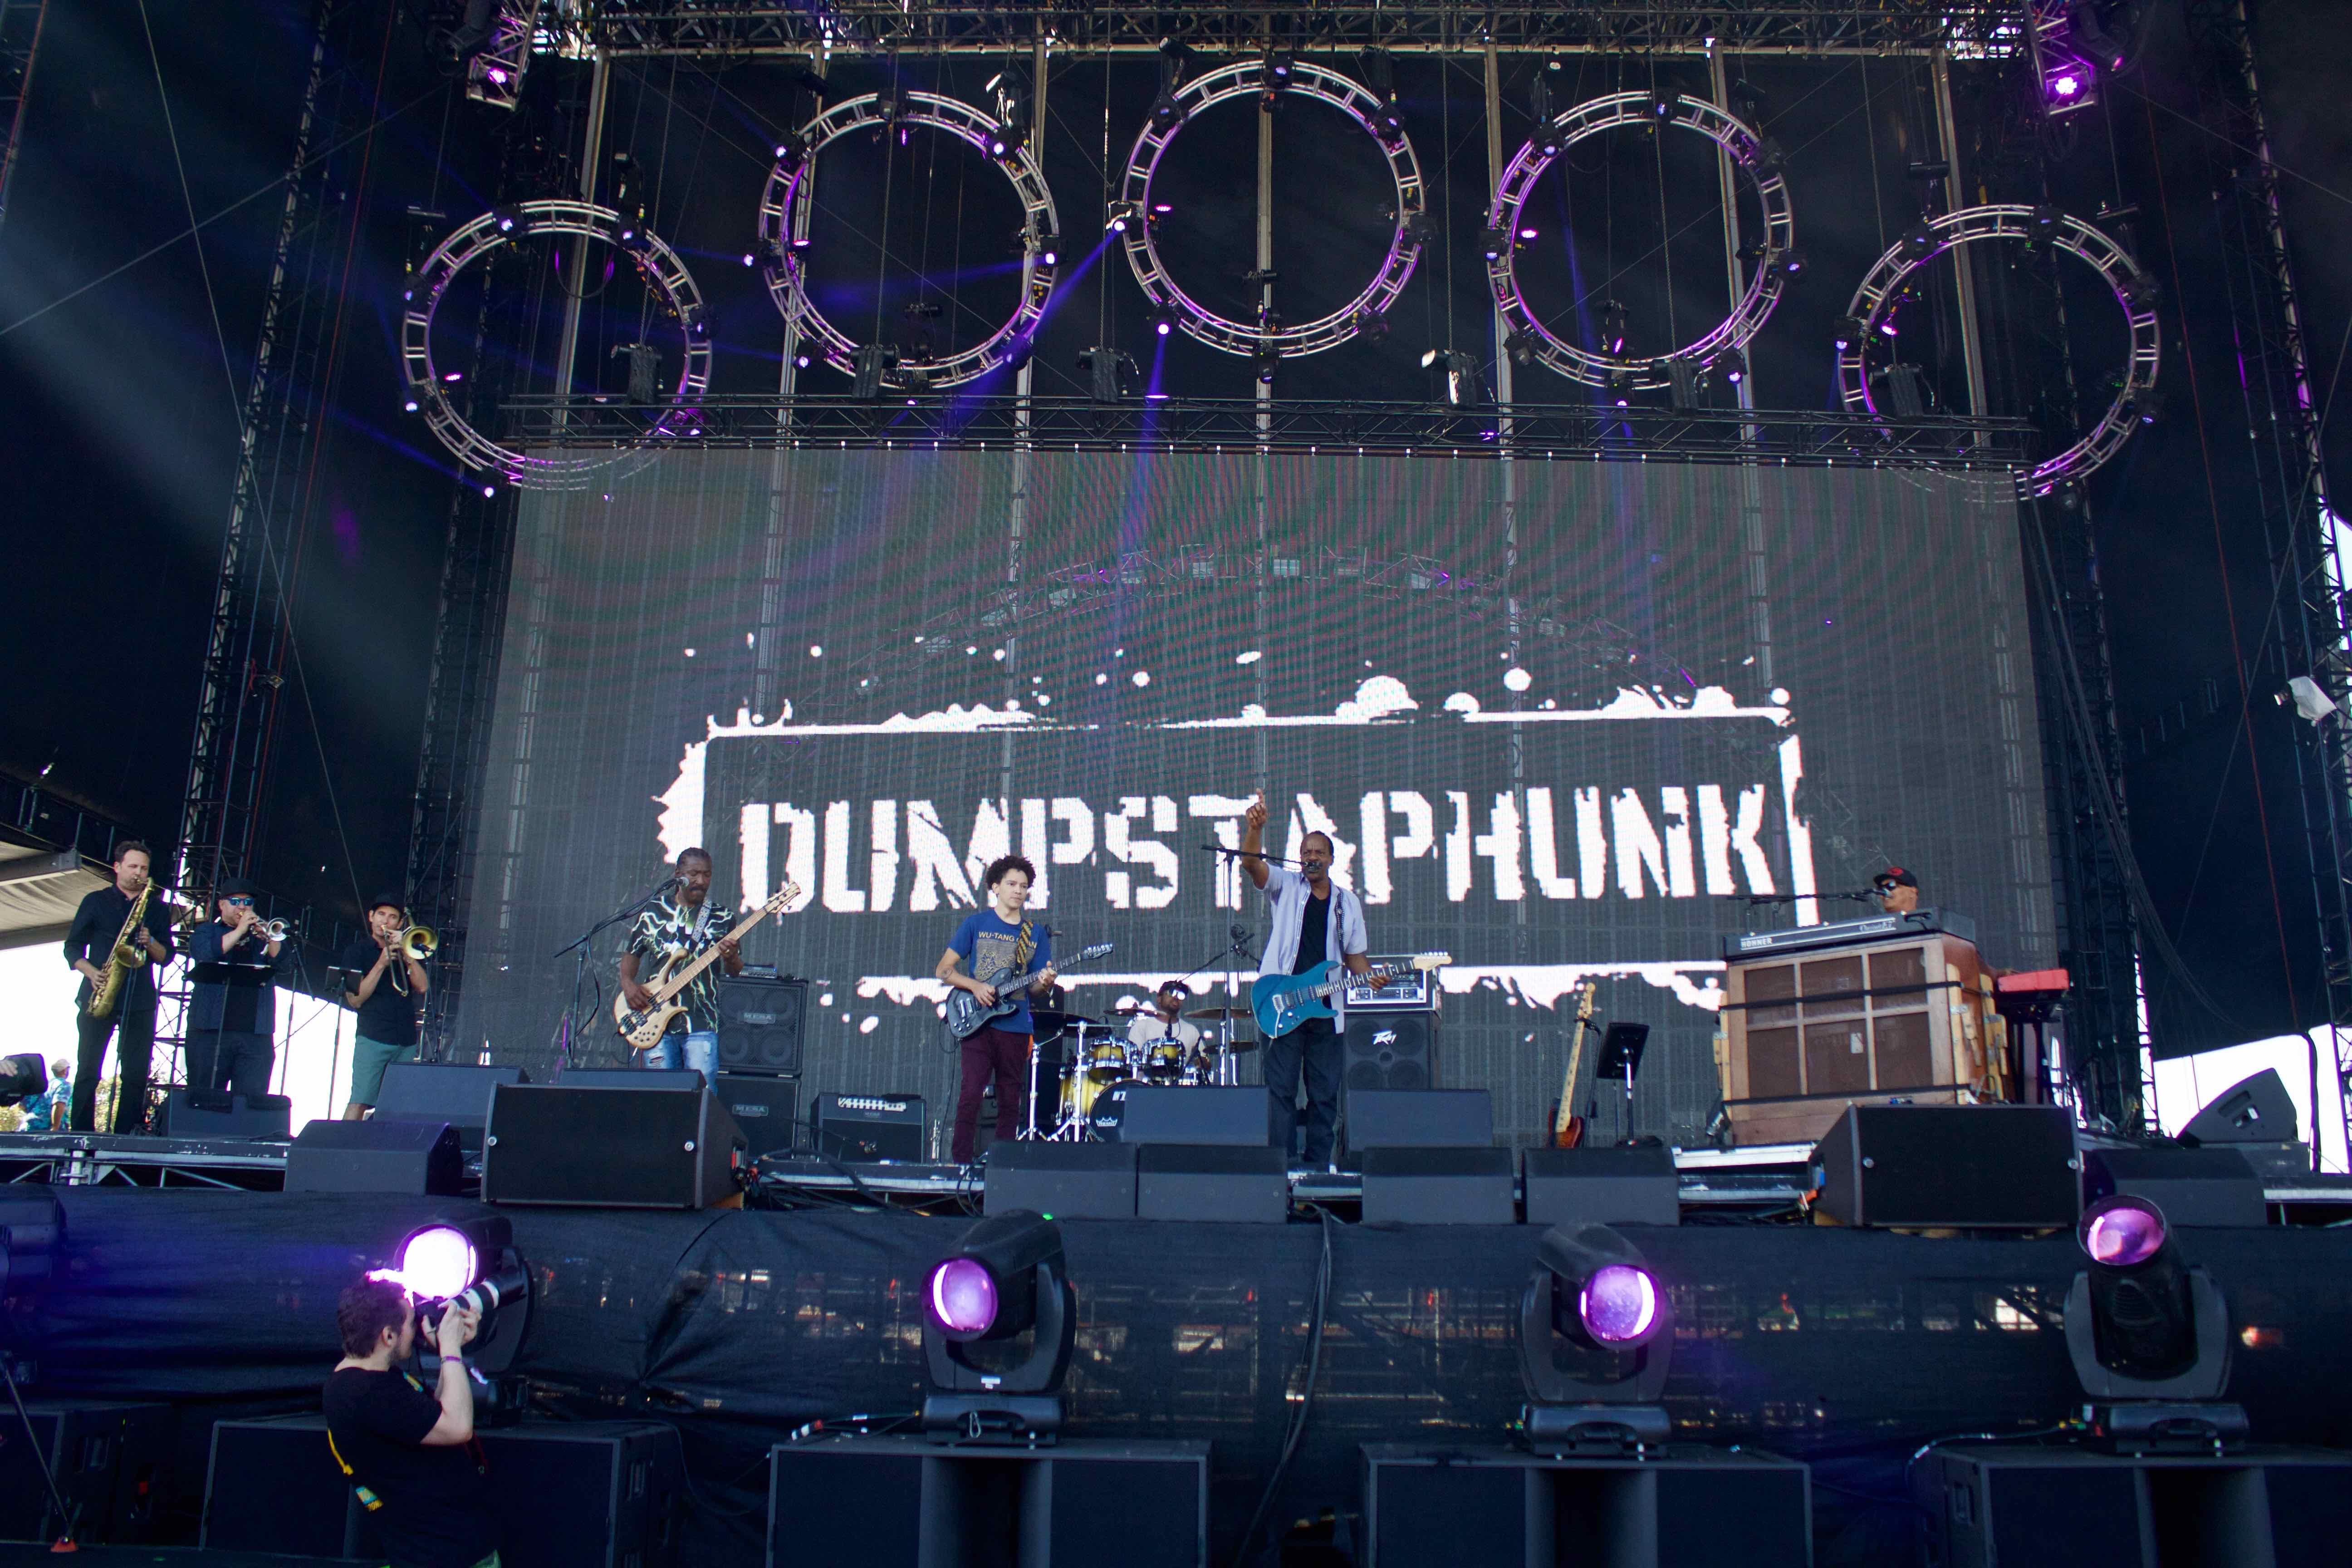 Dumpstaphunk at KAABOO 2016, September 16th. Photo by Derrick K. Lee, Esq. (@Methodman13) for www.BlurredCulture.com.